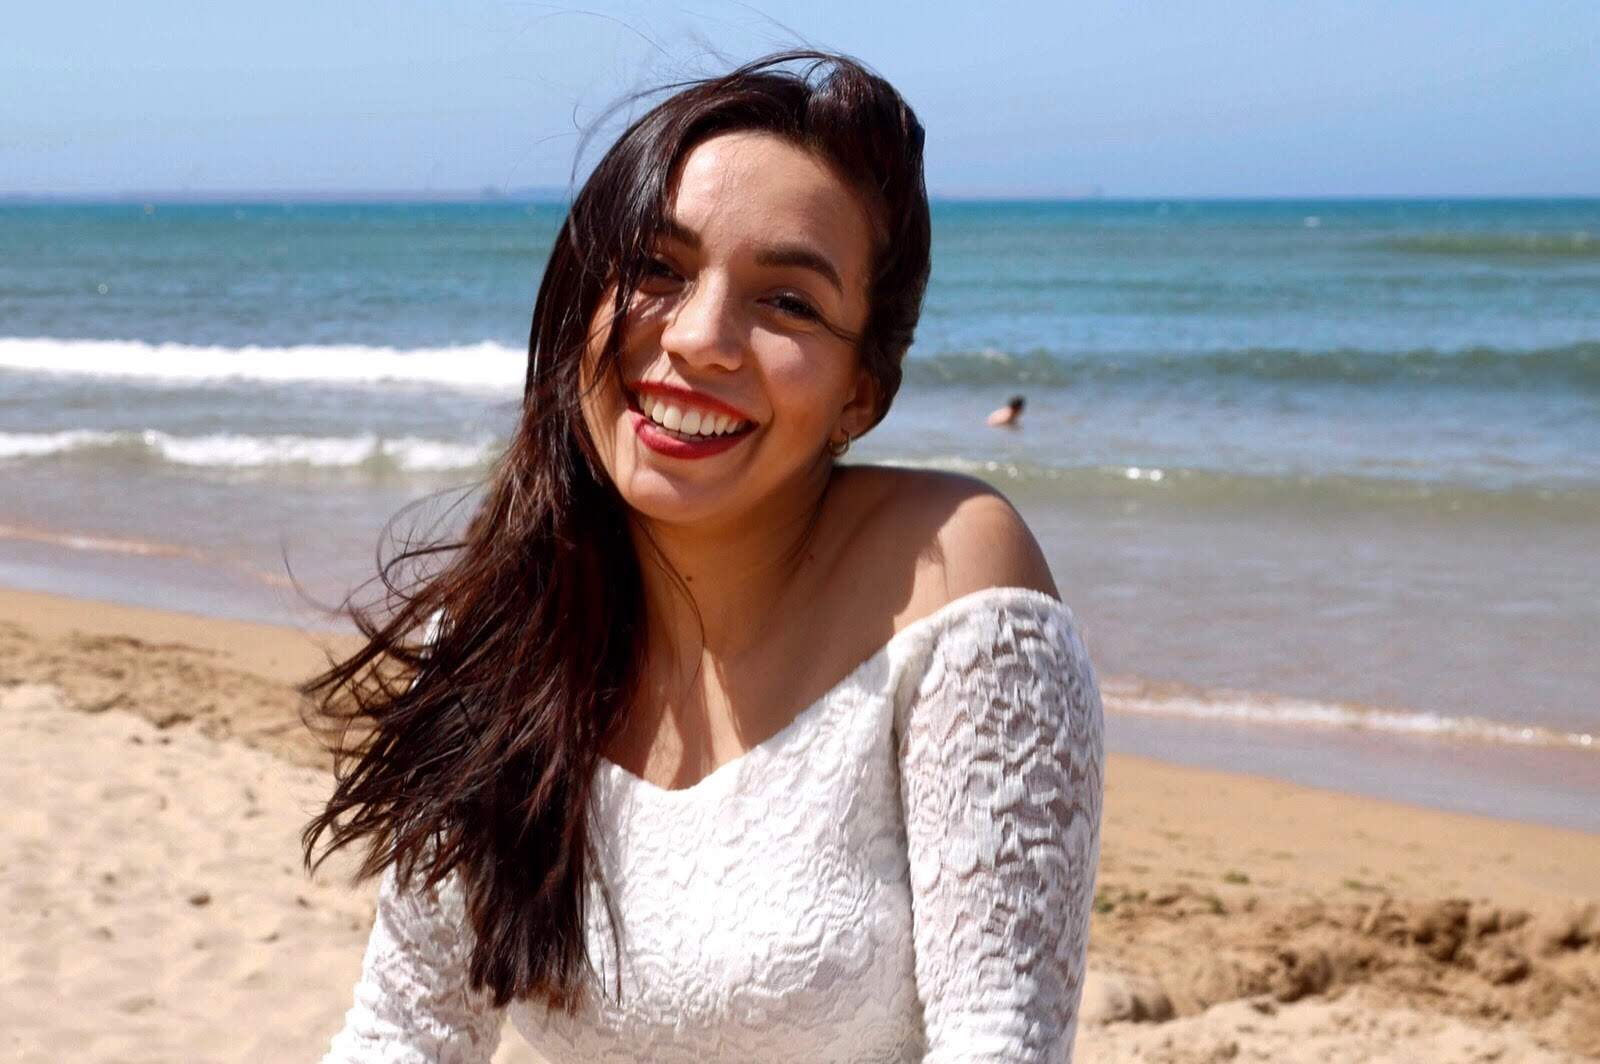 Go to Sara Riaño's profile